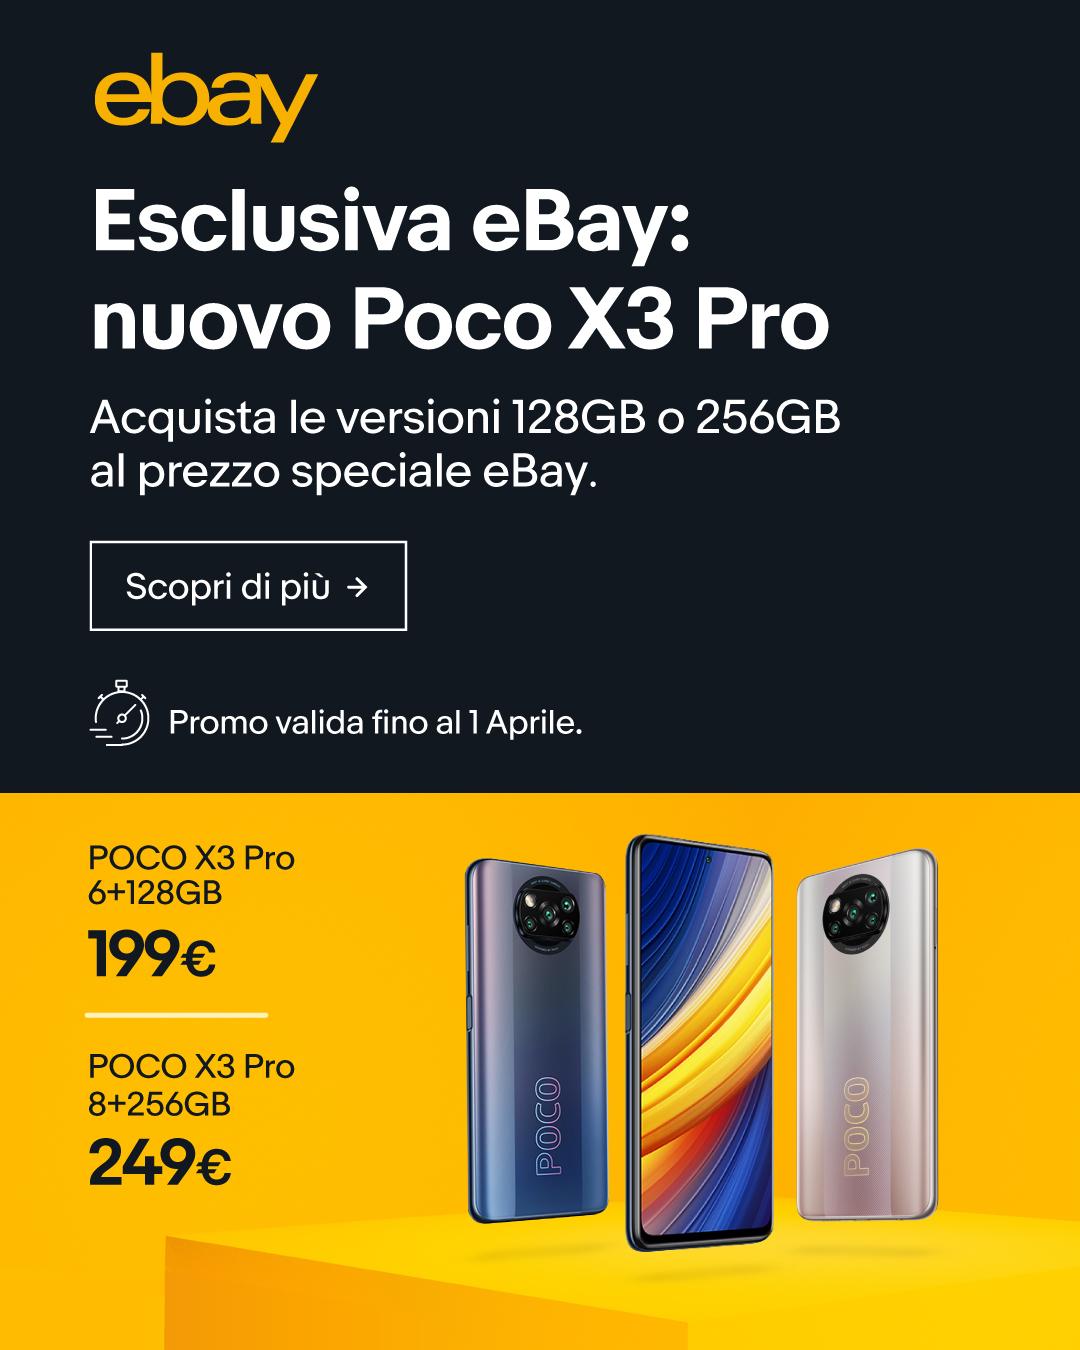 offerta lancio POCO X3 Pro eBay